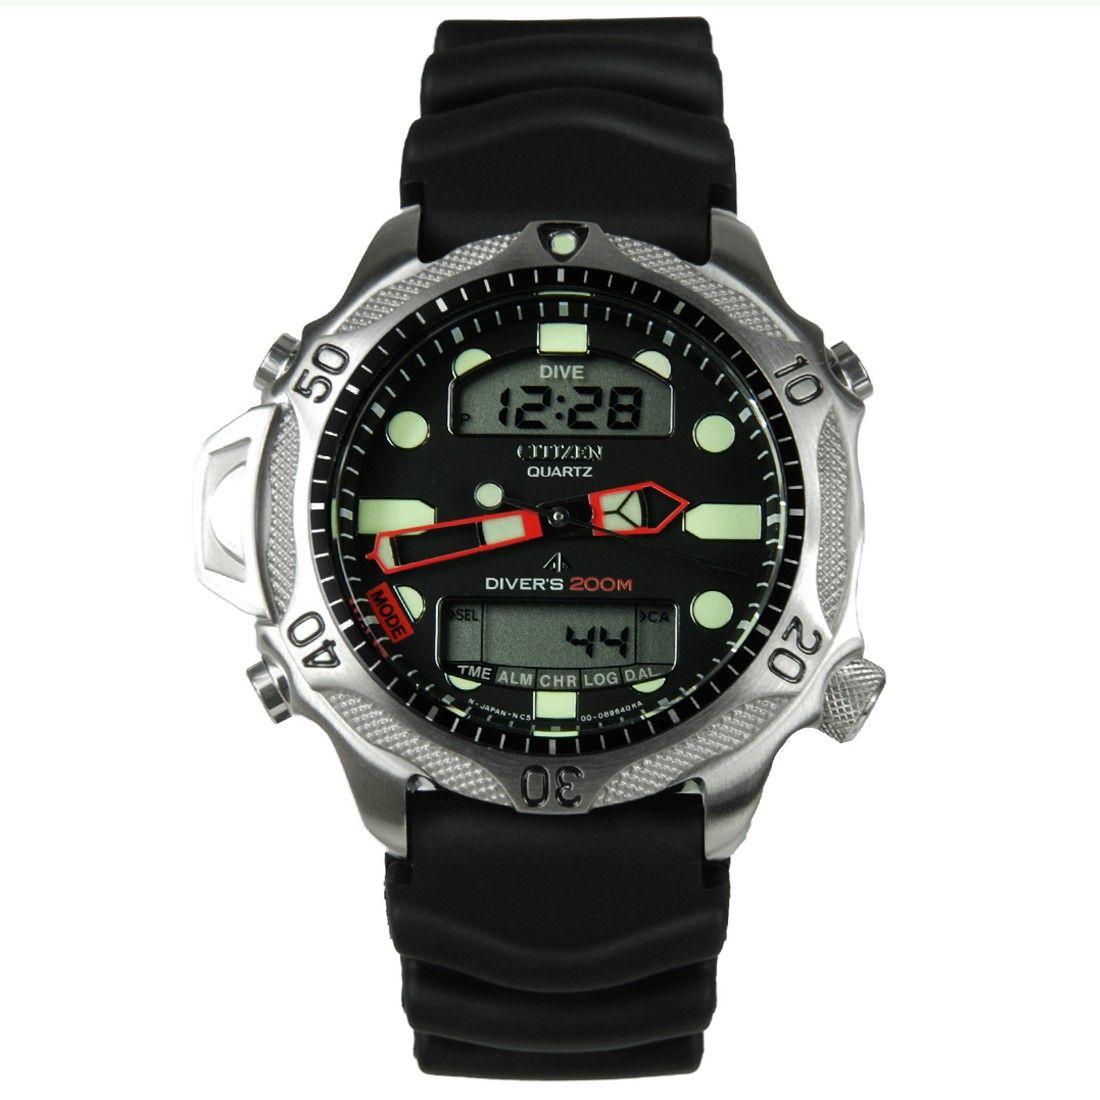 Citizen Promaster Dive Computer Watch Jp1010 00e Jp1010 01e Jp1011 07e Pre Owned Watches Dive Computers Casio Watch